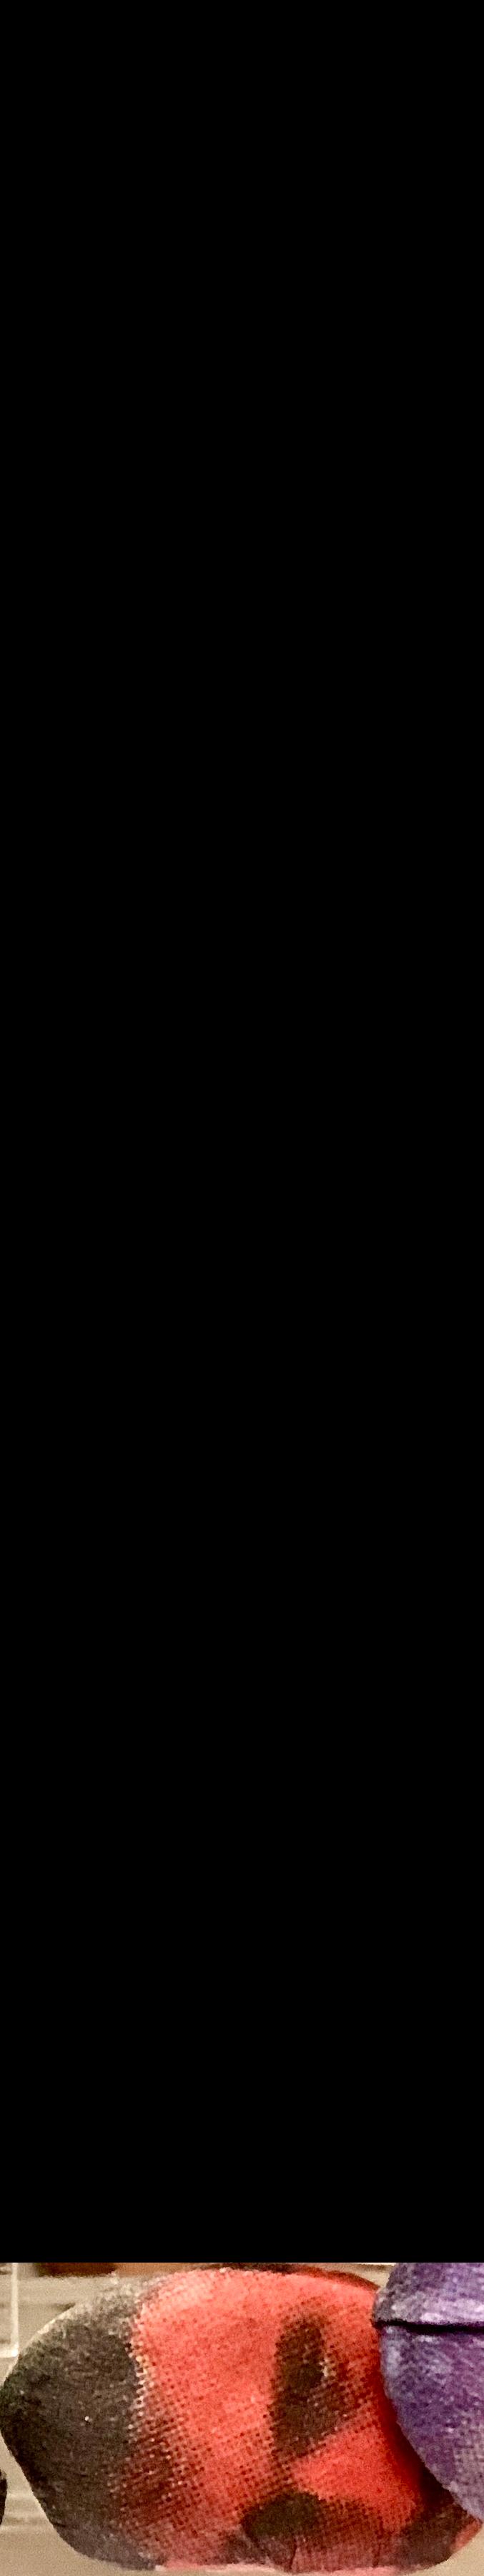 2019-12-06-032